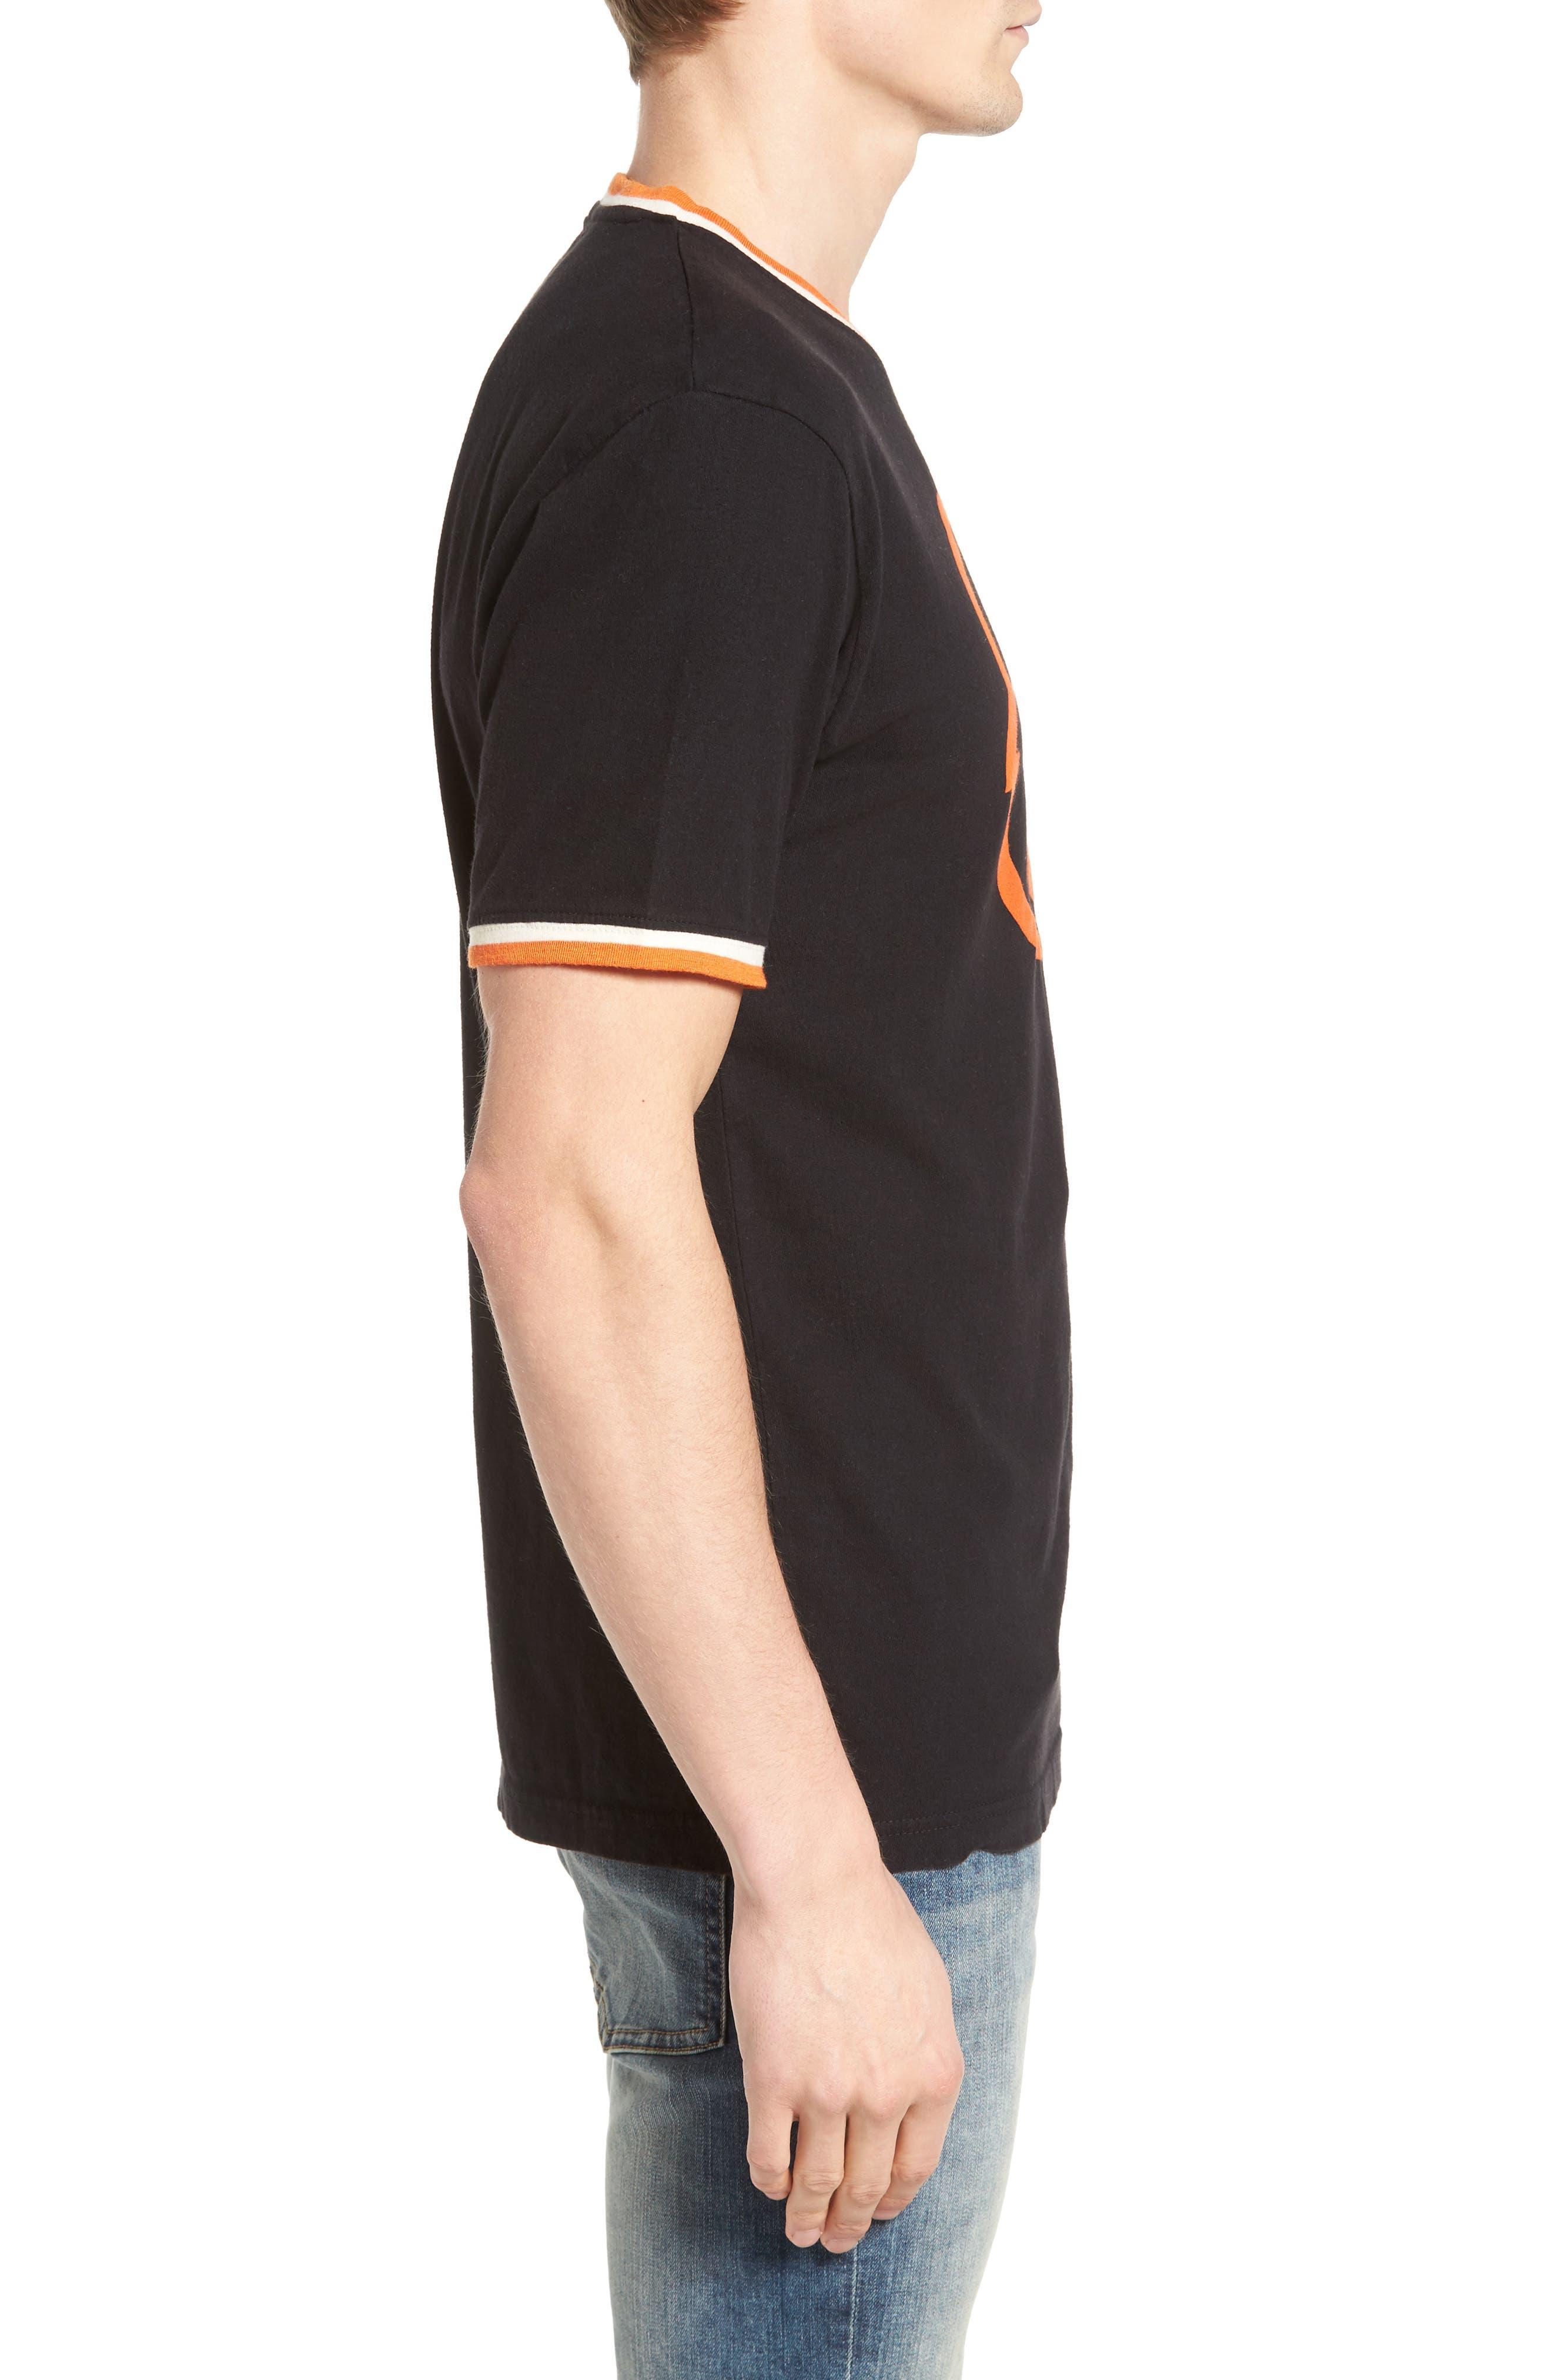 Eastwood Baltimore Orioles T-Shirt,                             Alternate thumbnail 3, color,                             Black